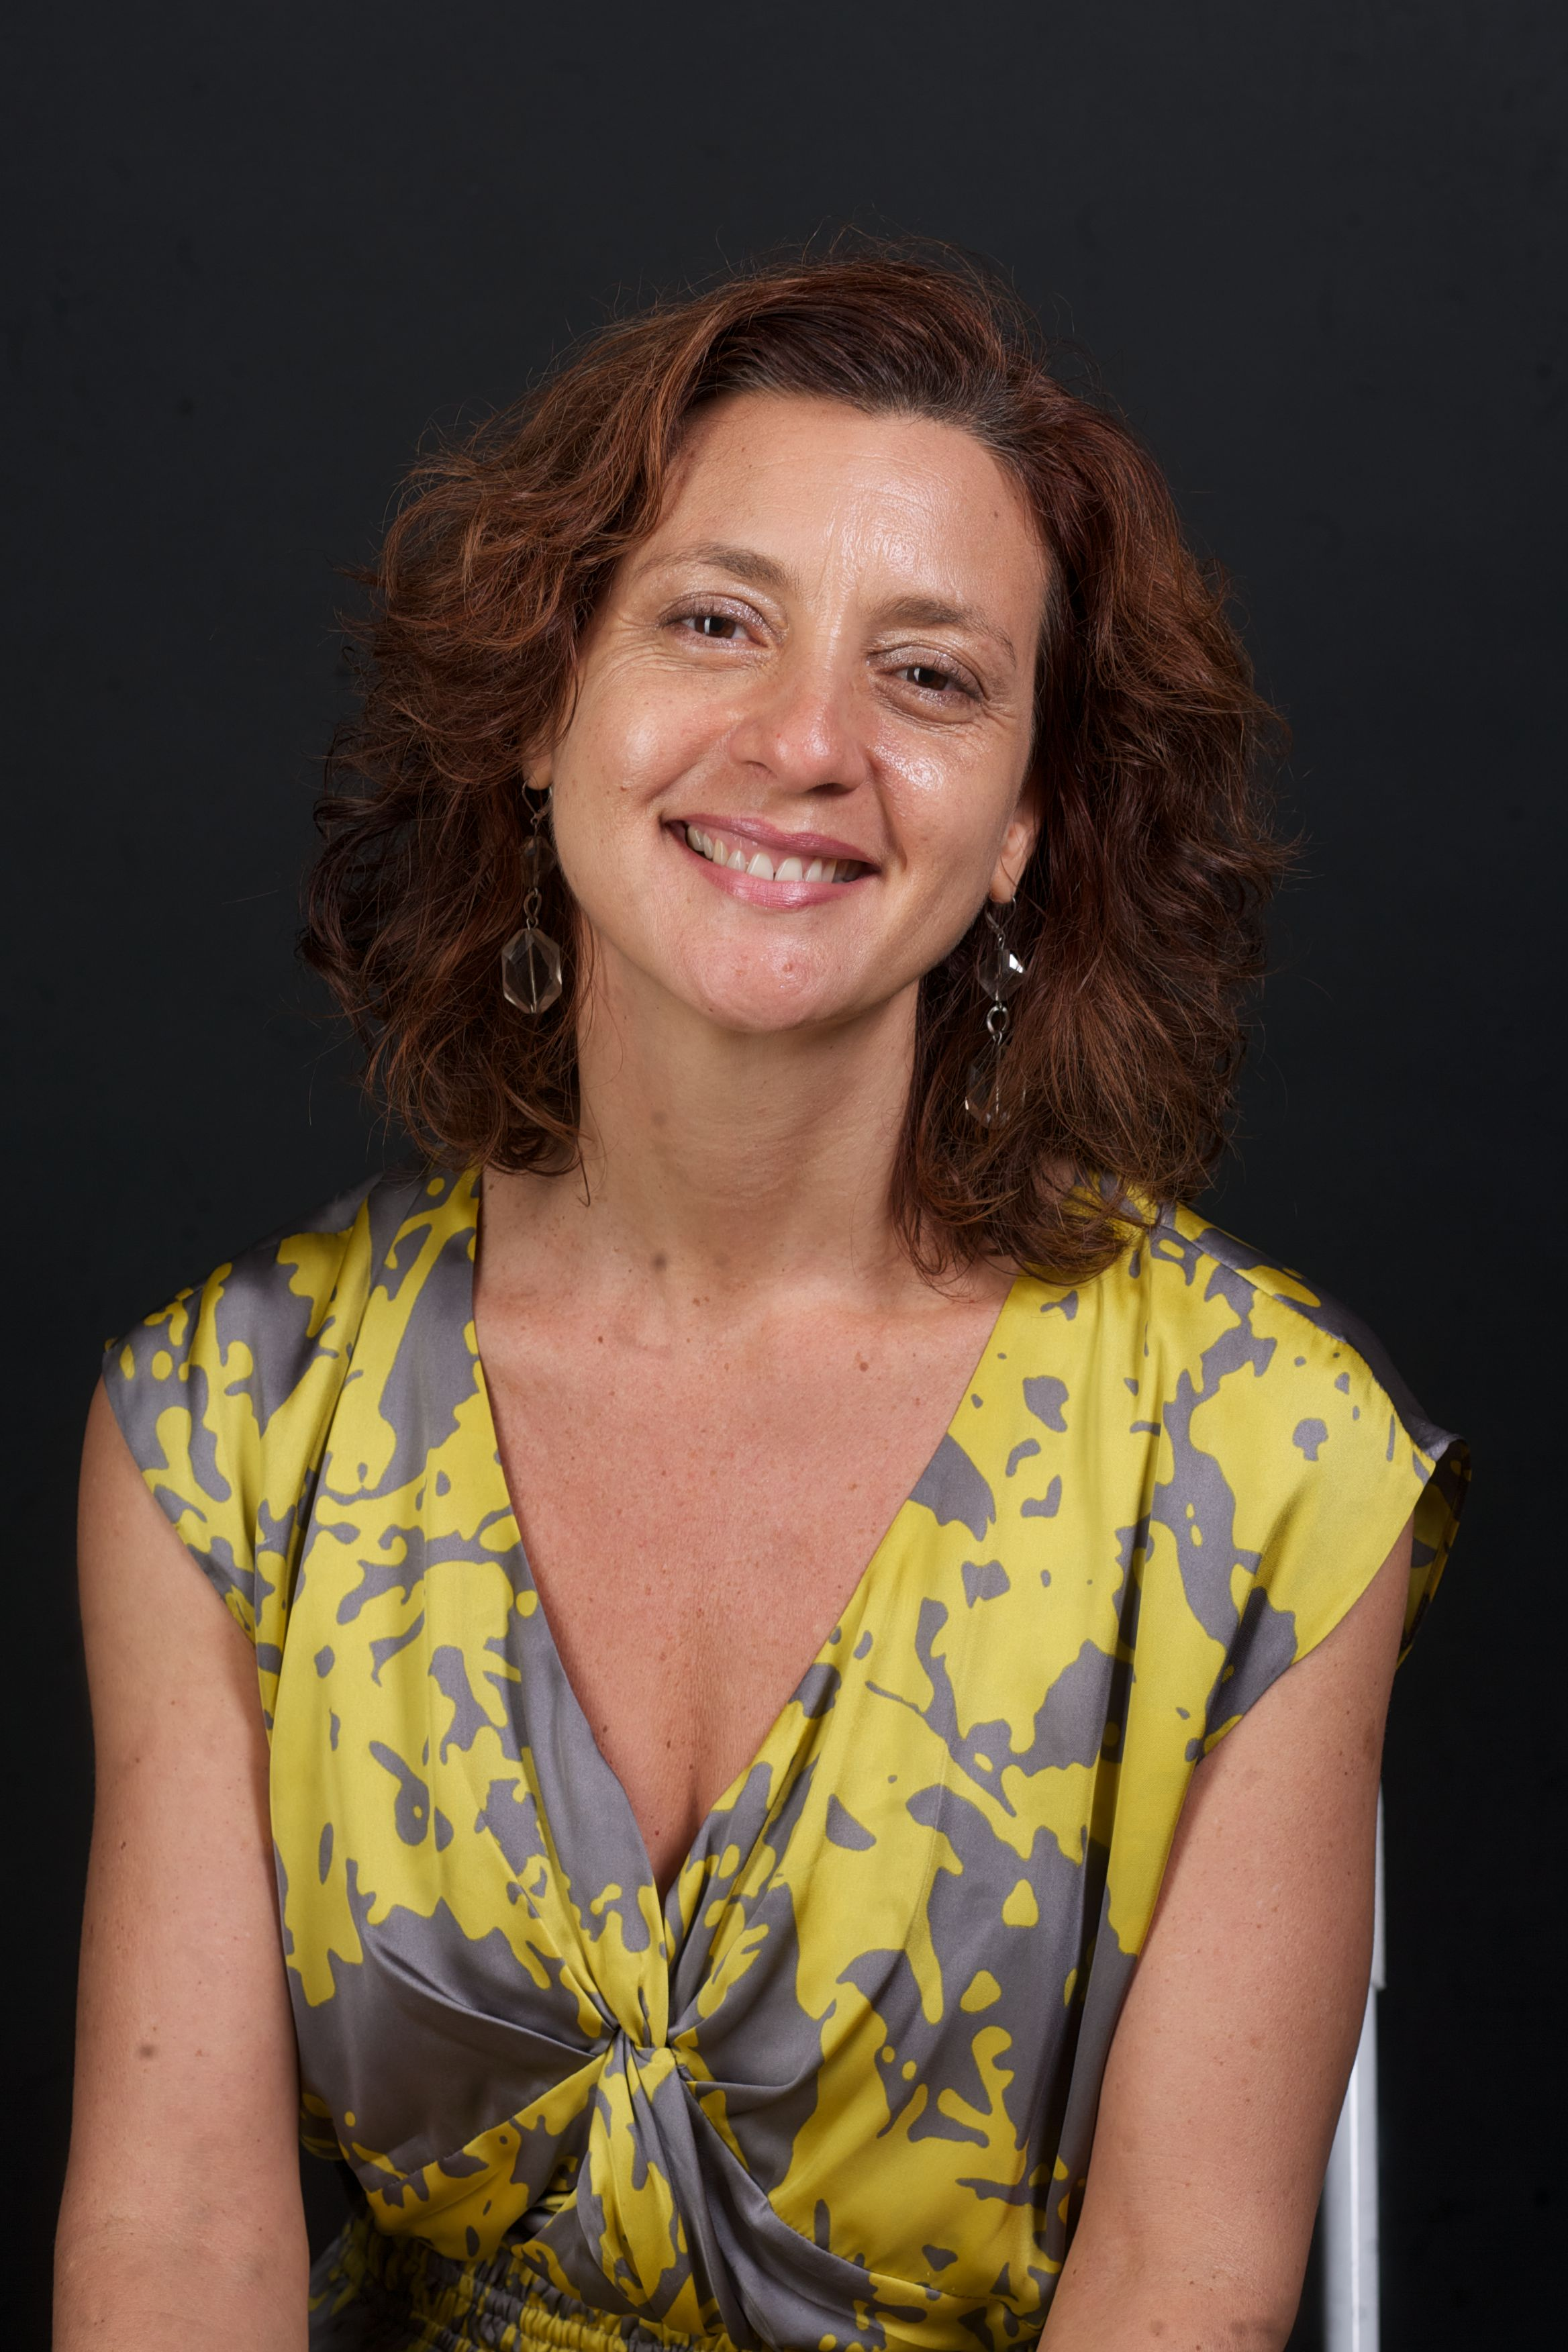 Chloe Georas